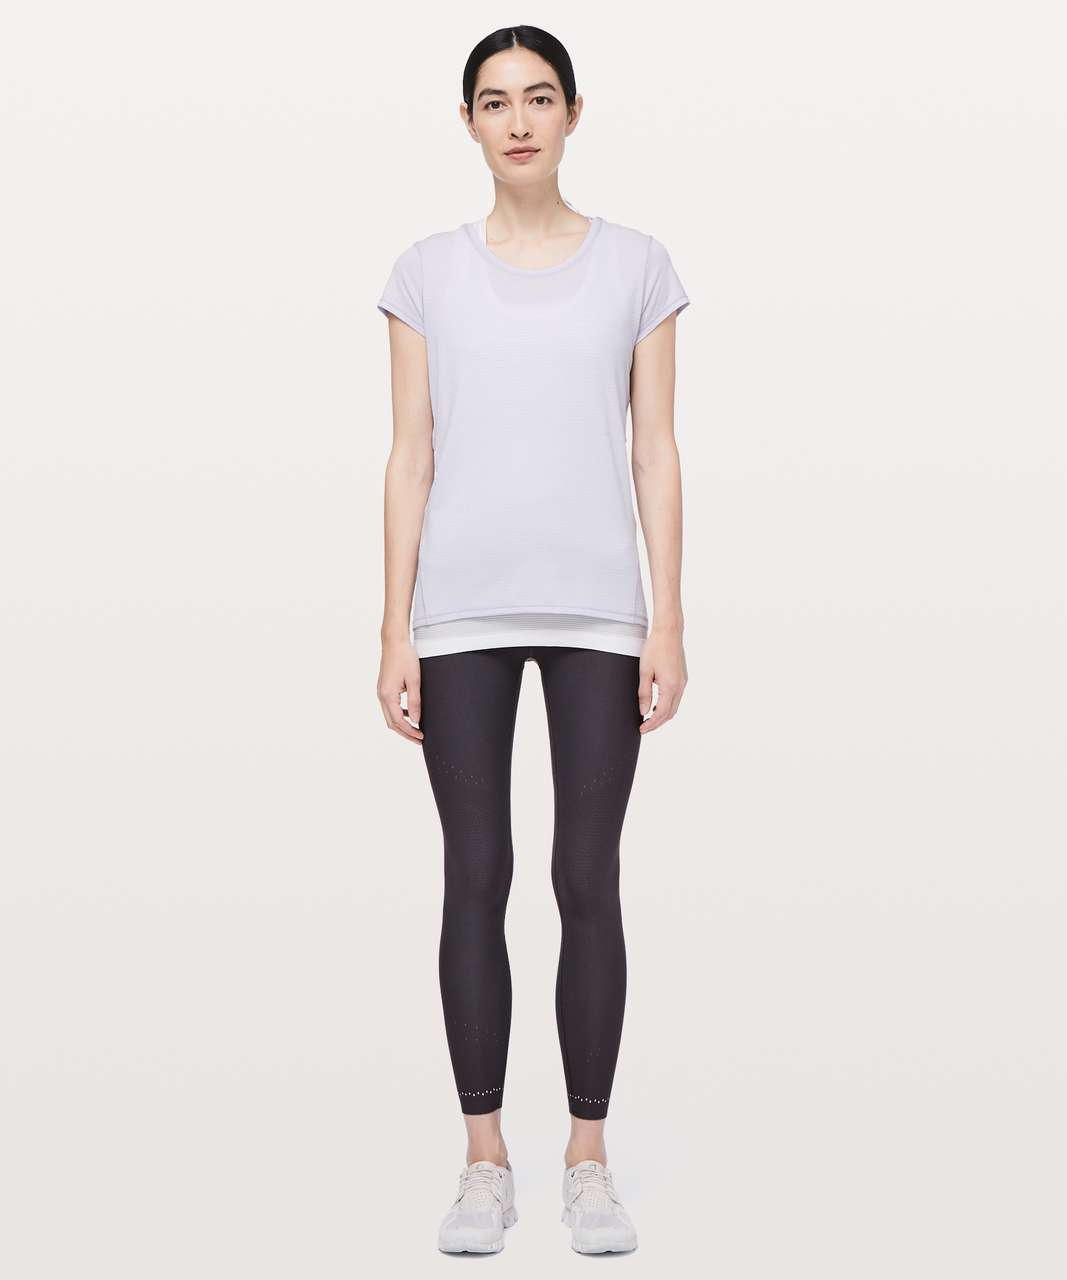 Lululemon Another Mile Short Sleeve - Heathered Sheer Lilac